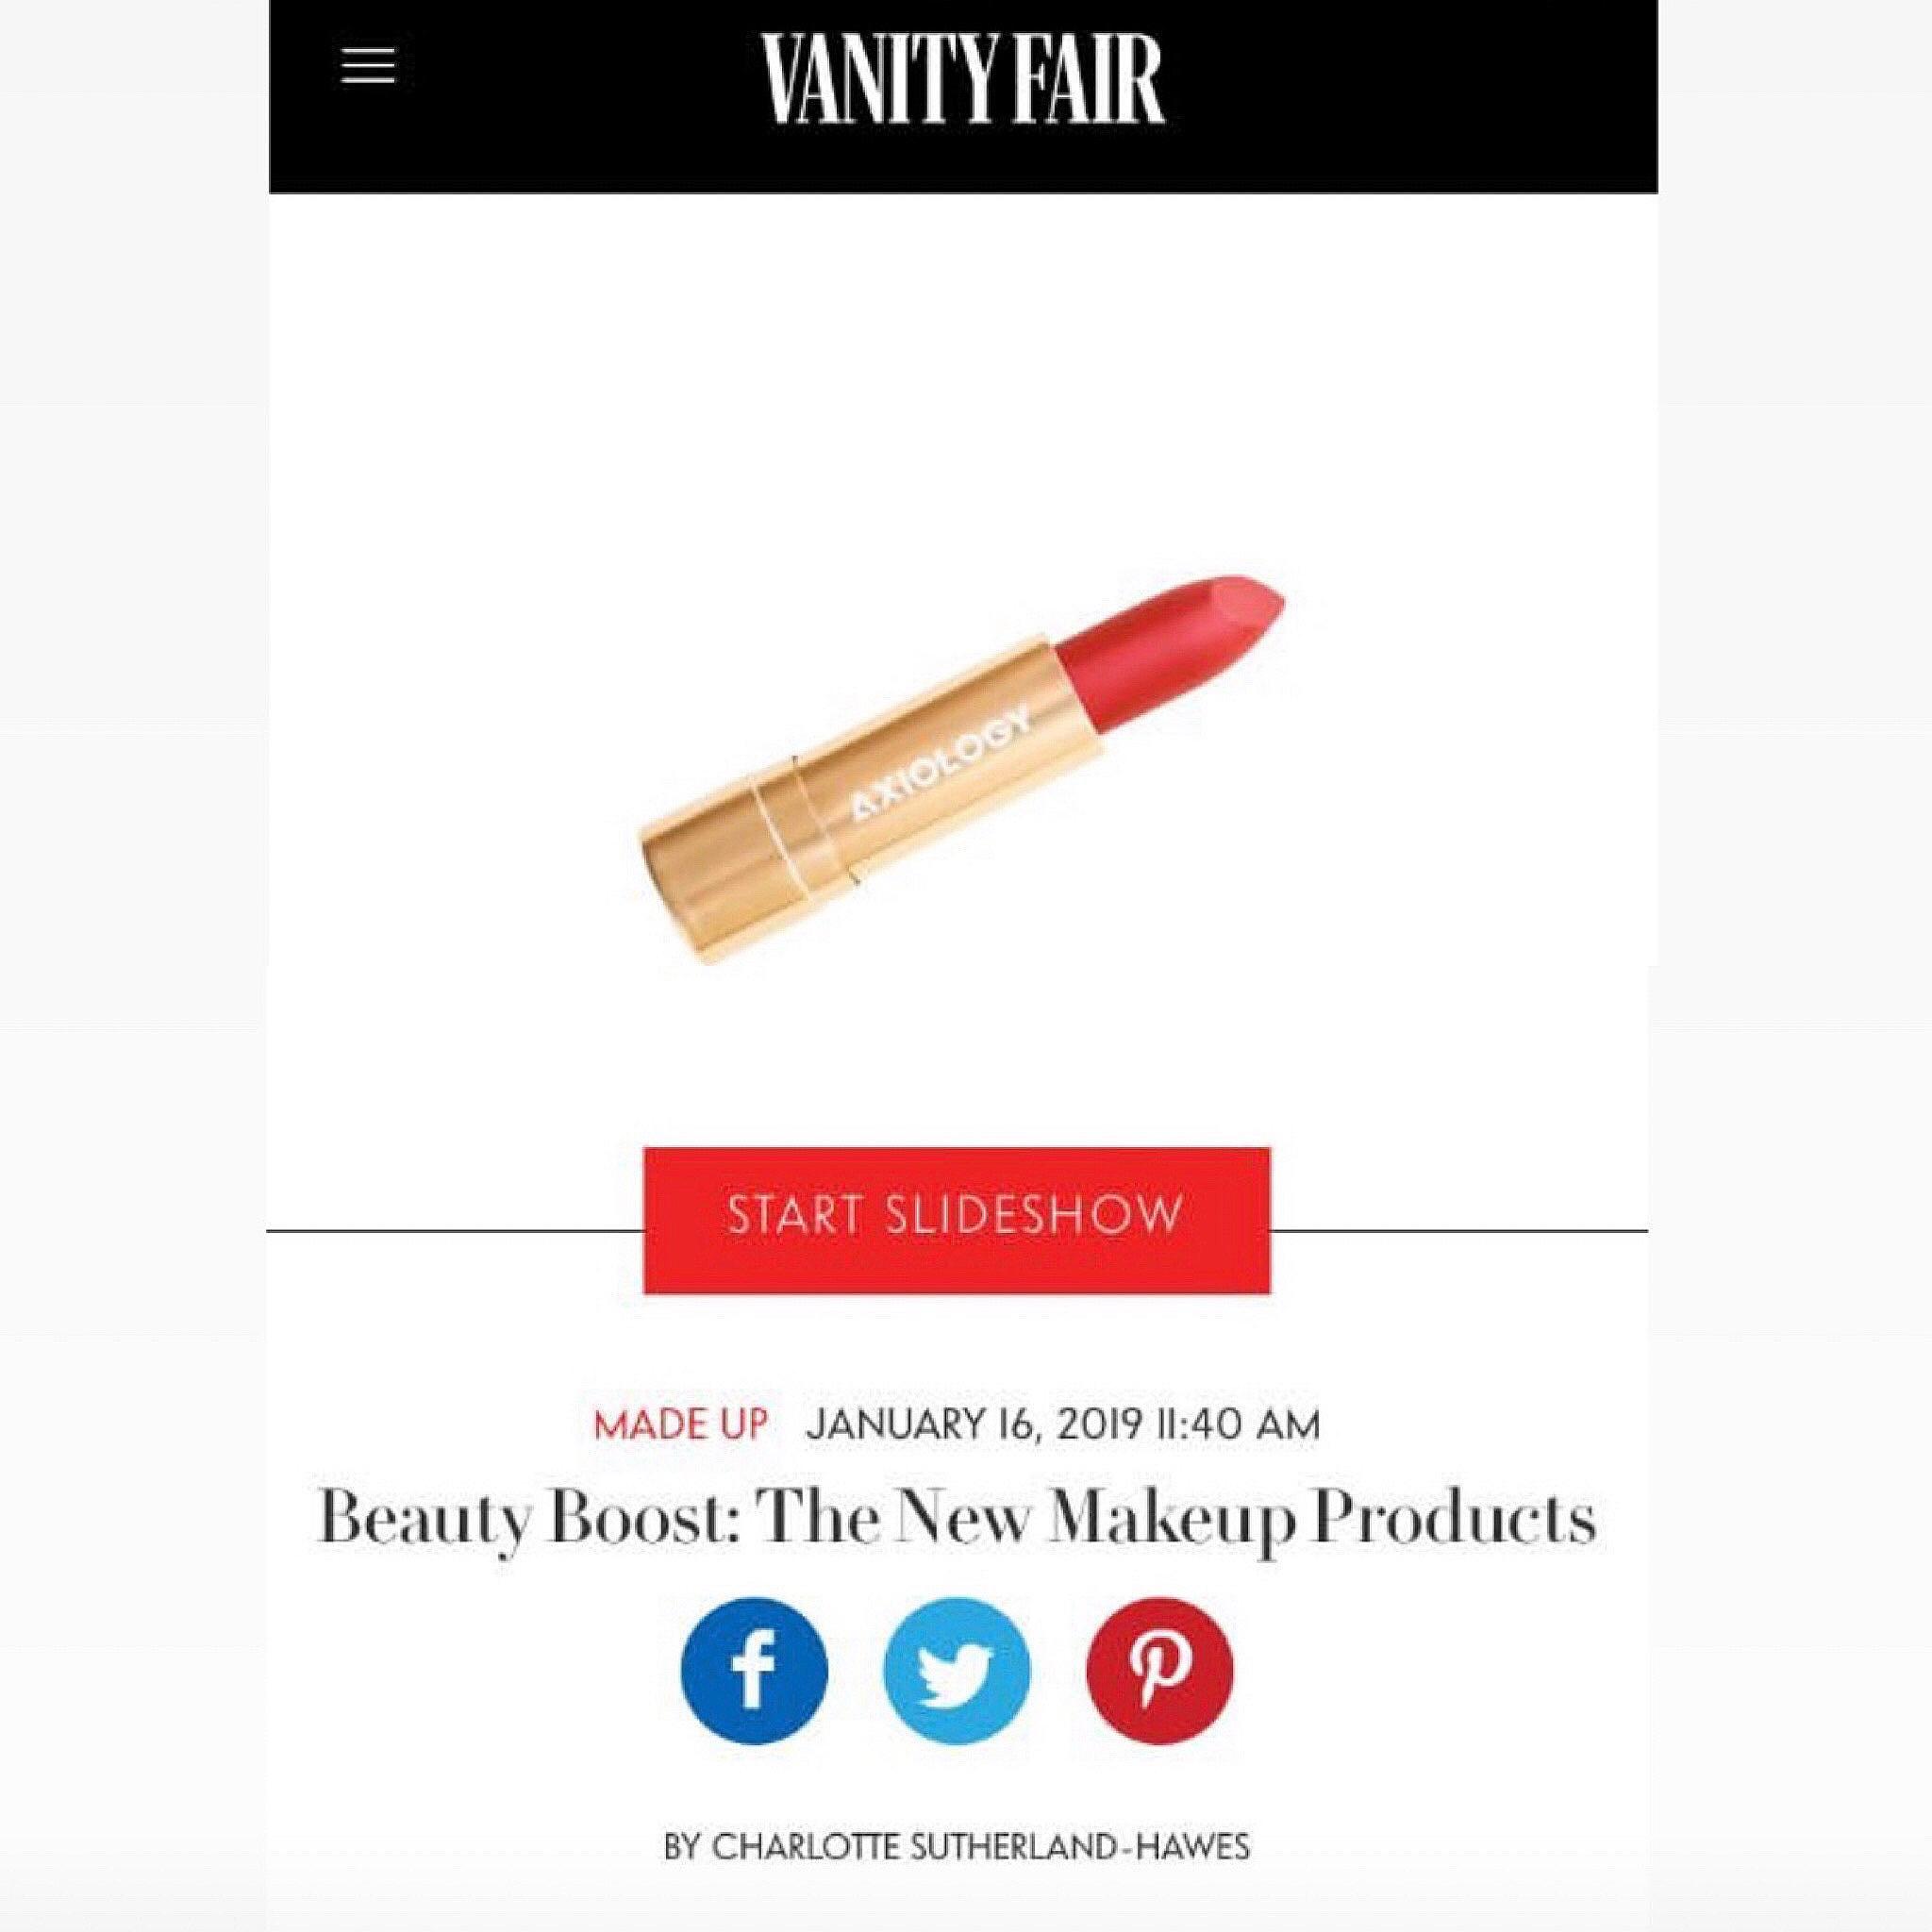 VANITY FAIR - JANUARY 2019   Axiology Lipstick shot